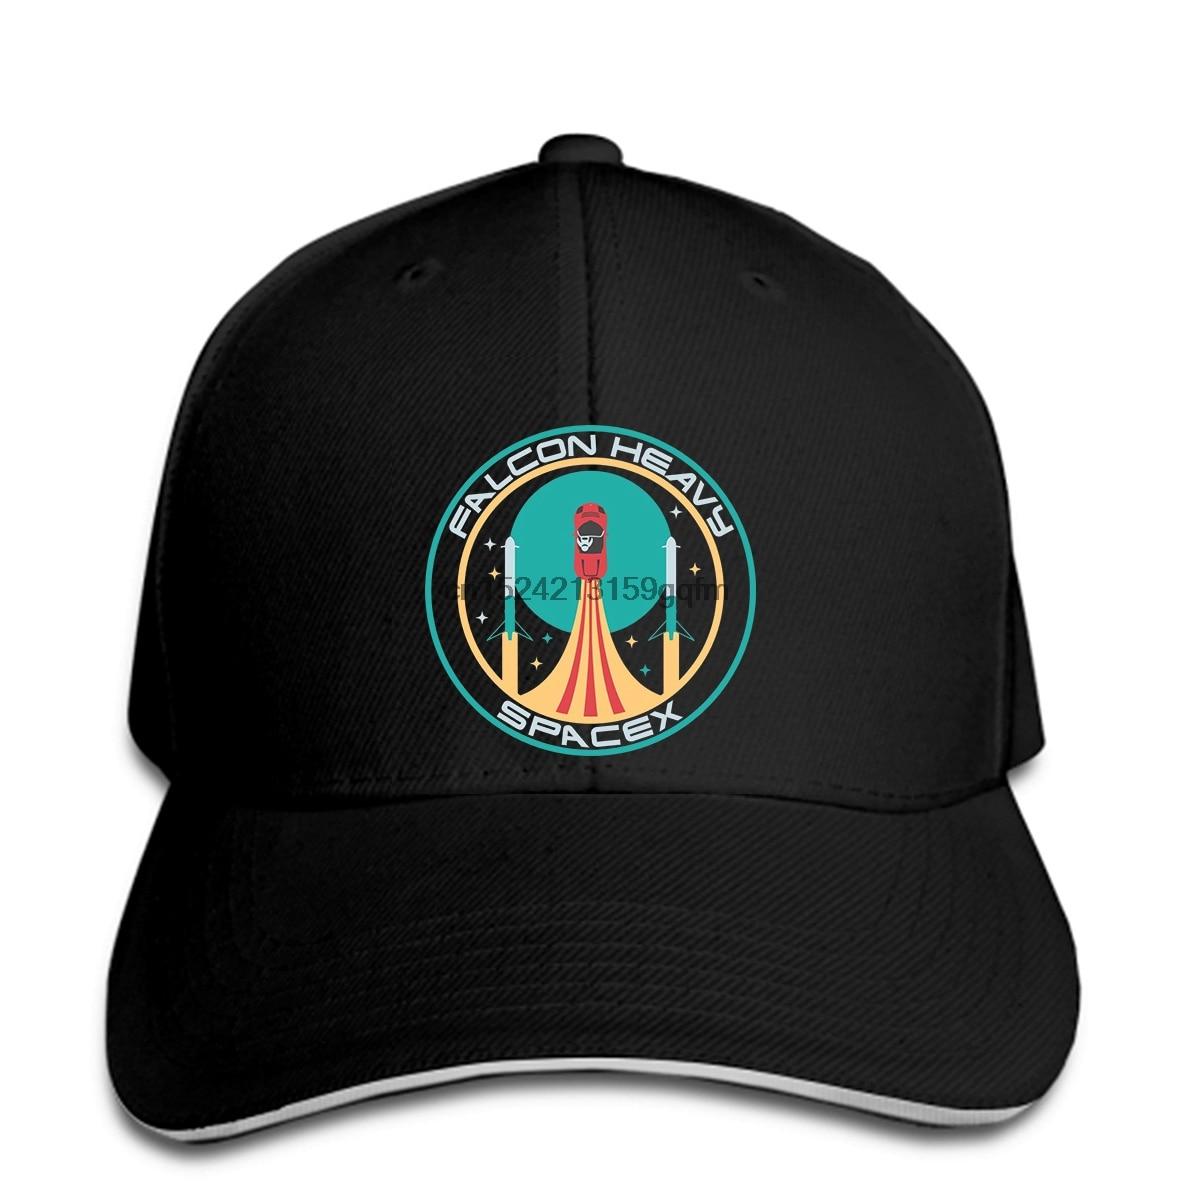 Beyzbol şapkası Elon misk Falcon ağır SpaceX bilim dünya günü mart bilim TESLA snapback şapka doruğa